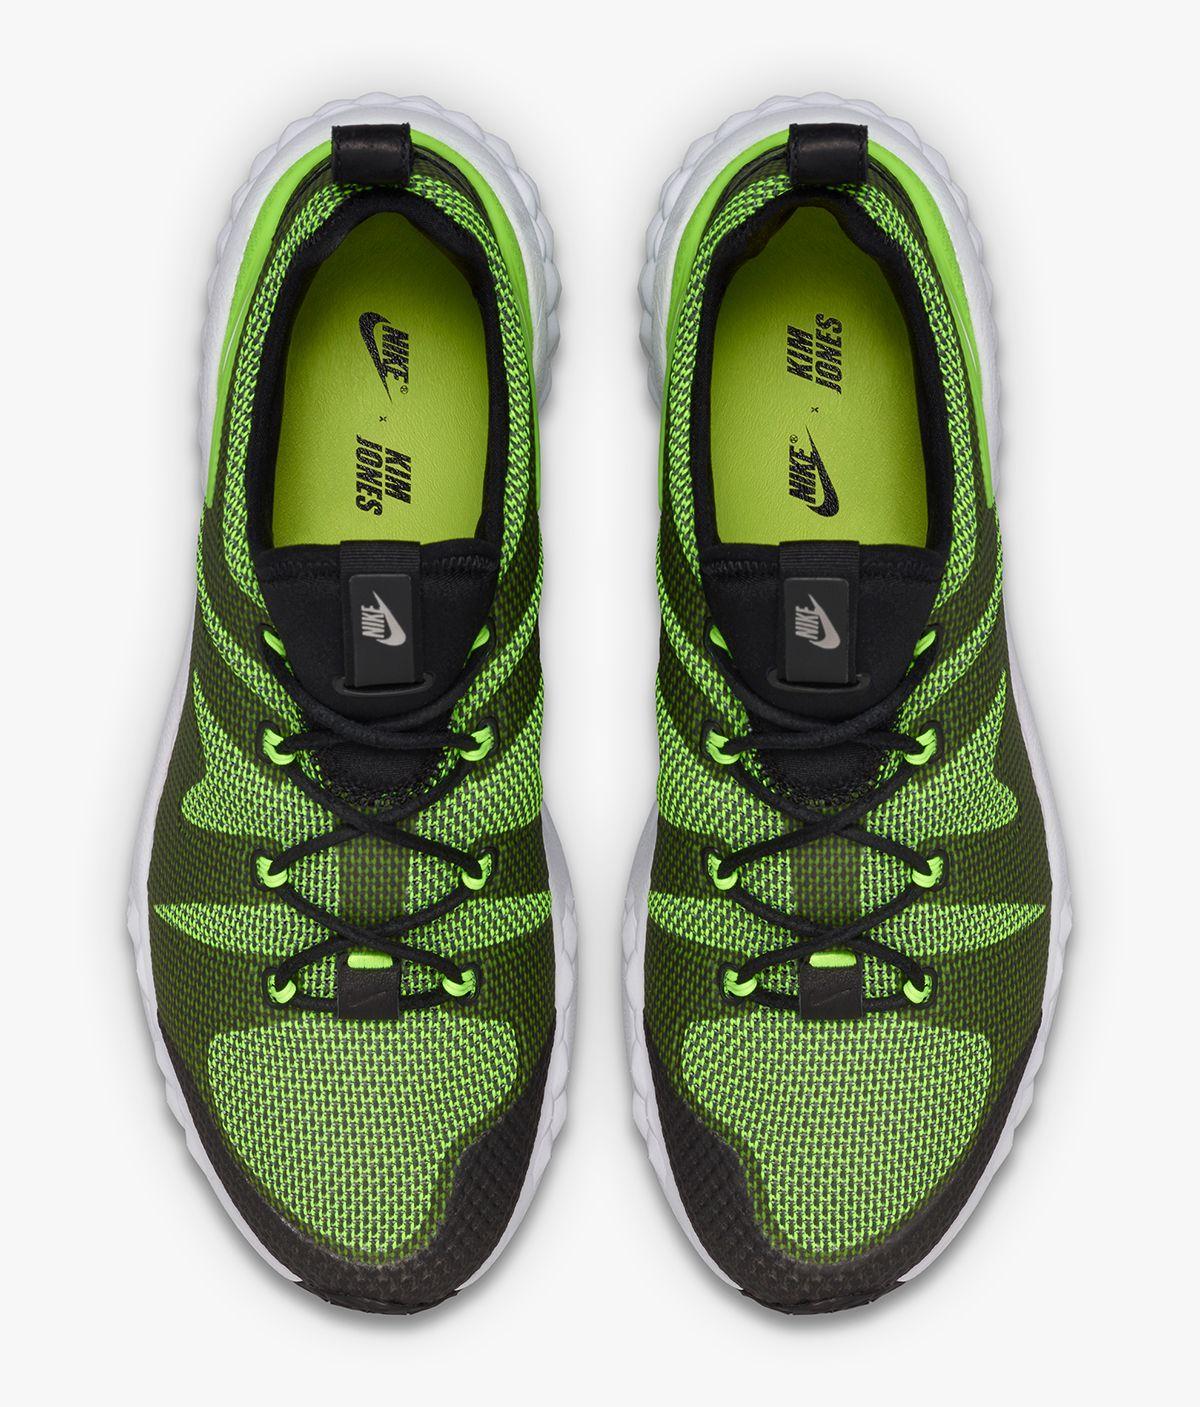 half off c8dcc 5adbc NikeLab Air Zoom LWP x Kim Jones - EU Kicks Sneaker Magazine Calzado Nike,